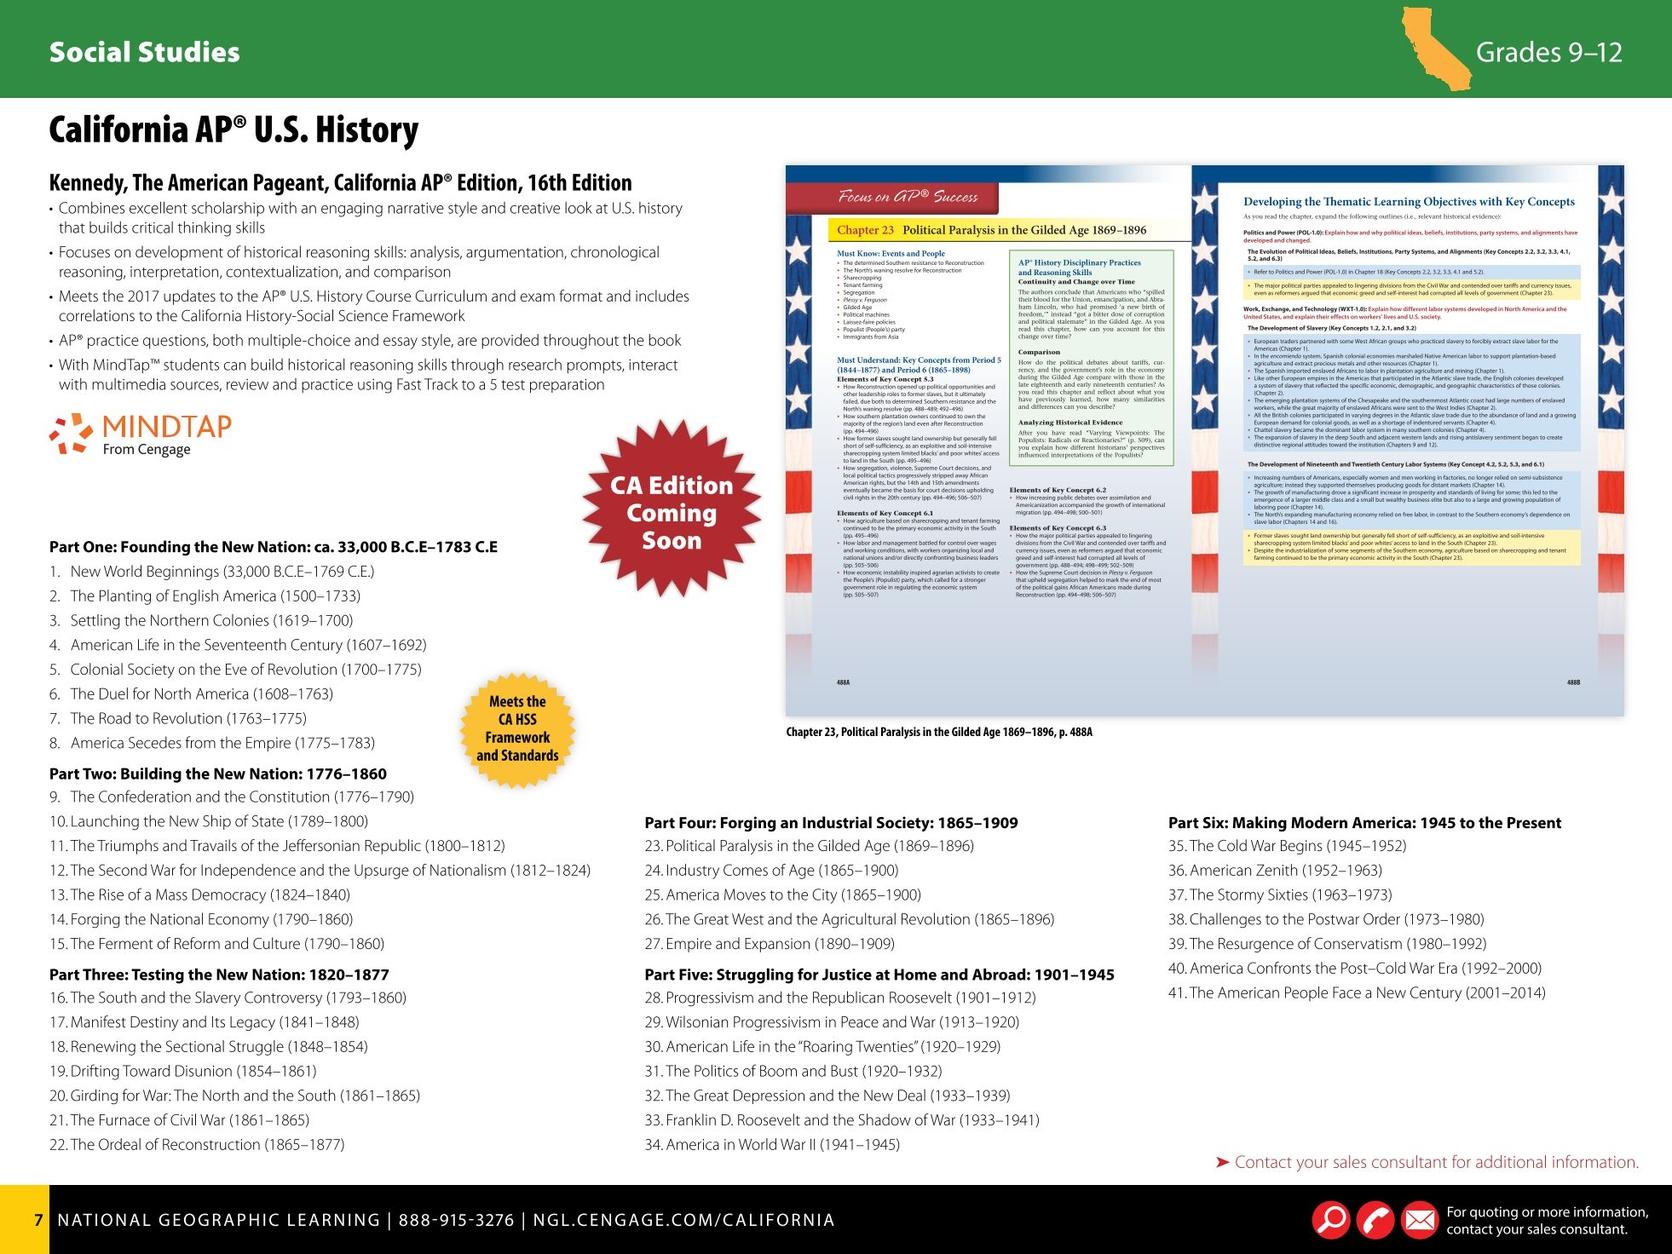 California Grades 9-12 Catalog - 2017-2018